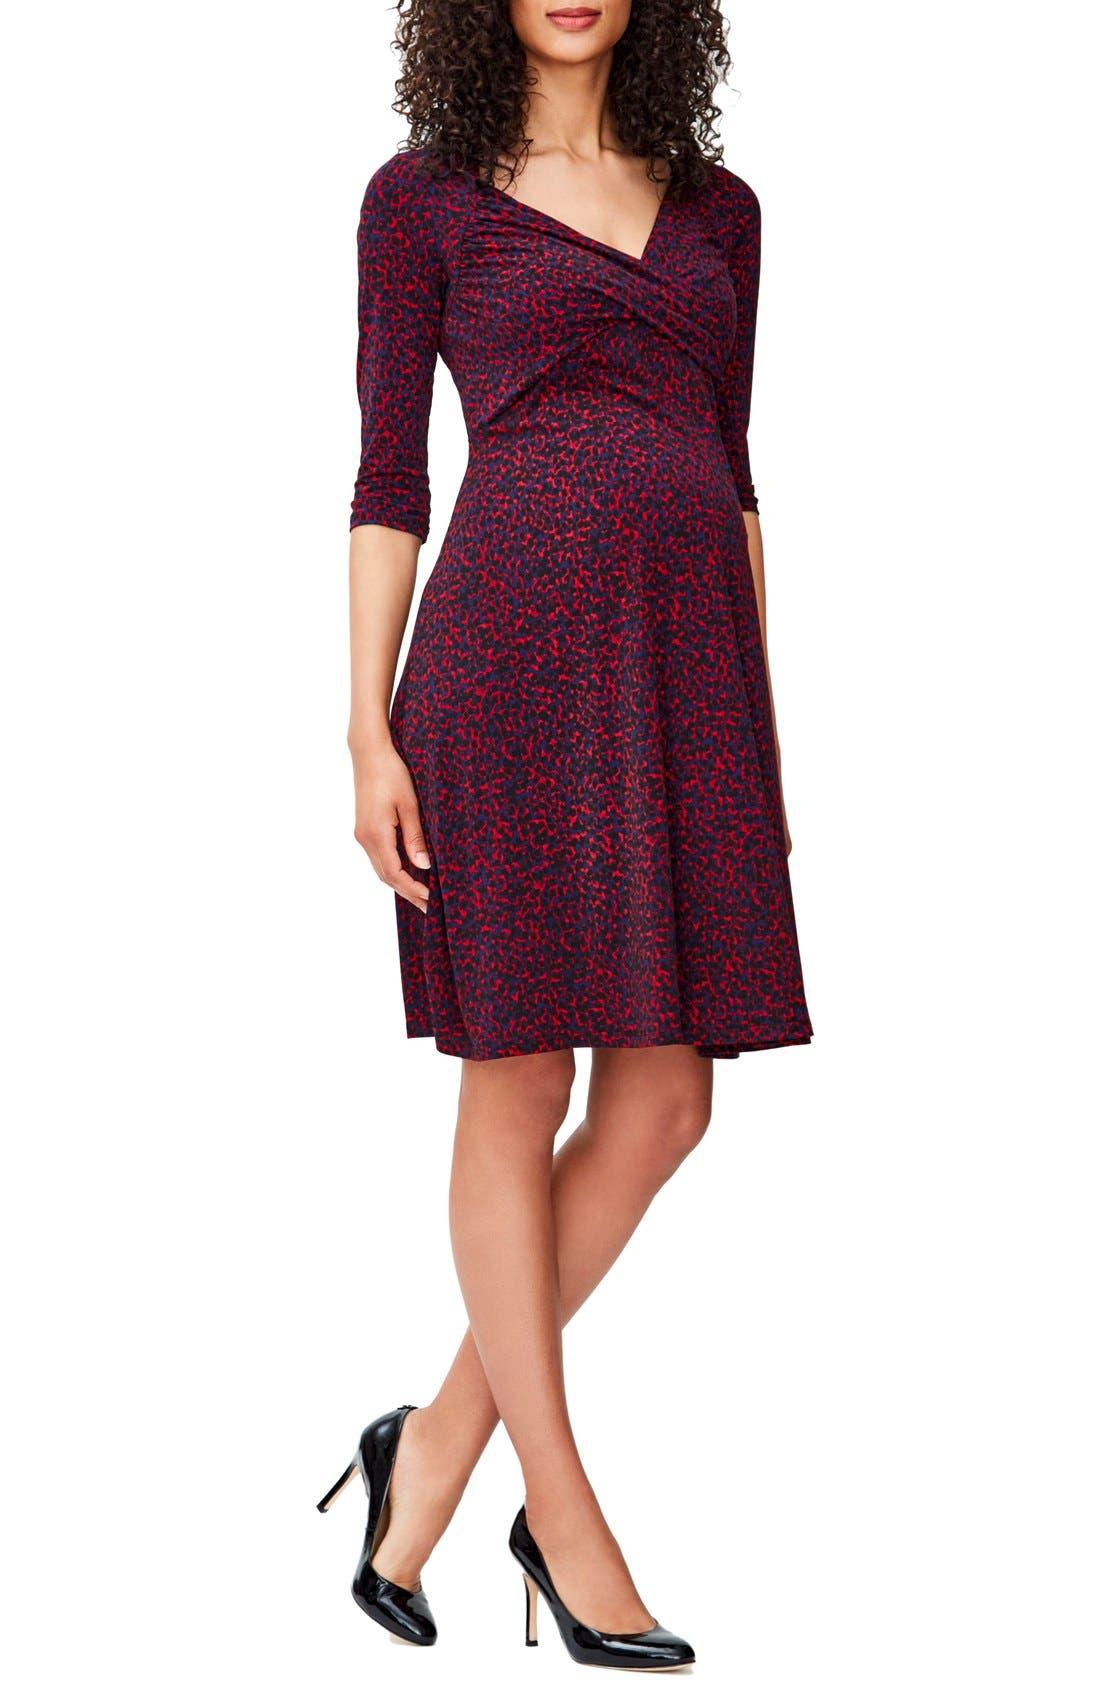 Alternate Image 1 Selected - Leota 'Sweetheart' Maternity Dress